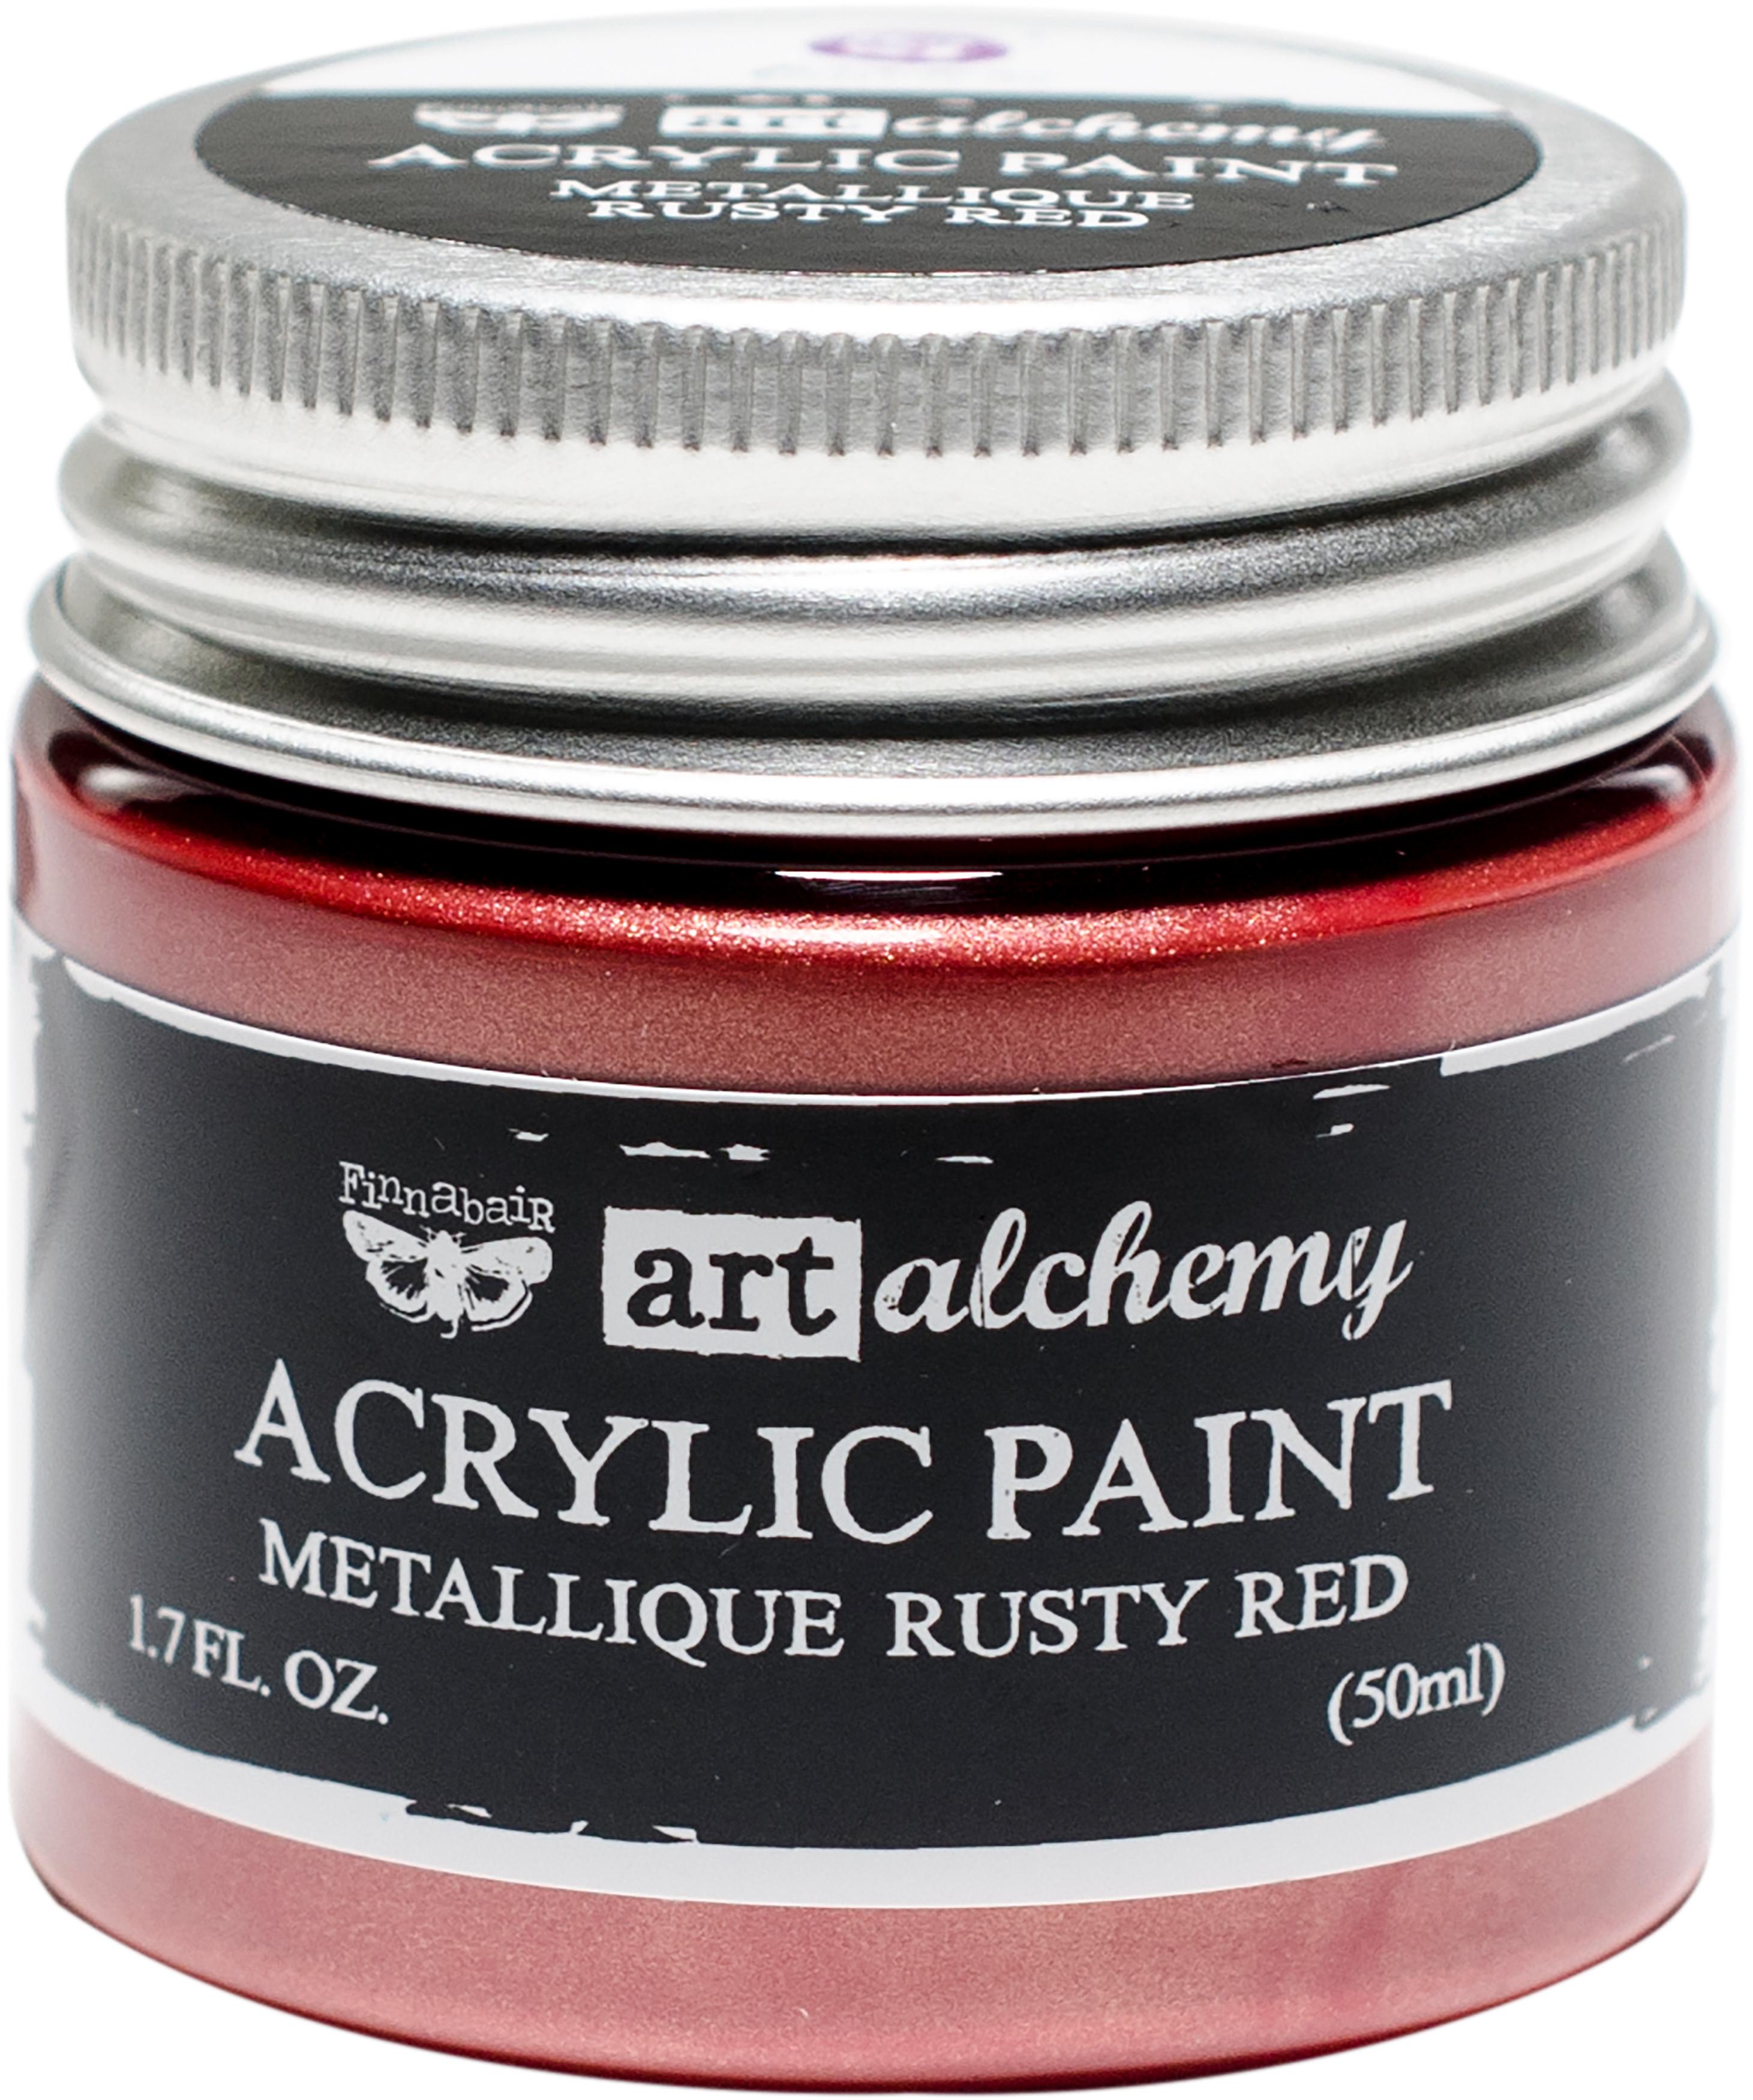 FB Metallique Rusty Red